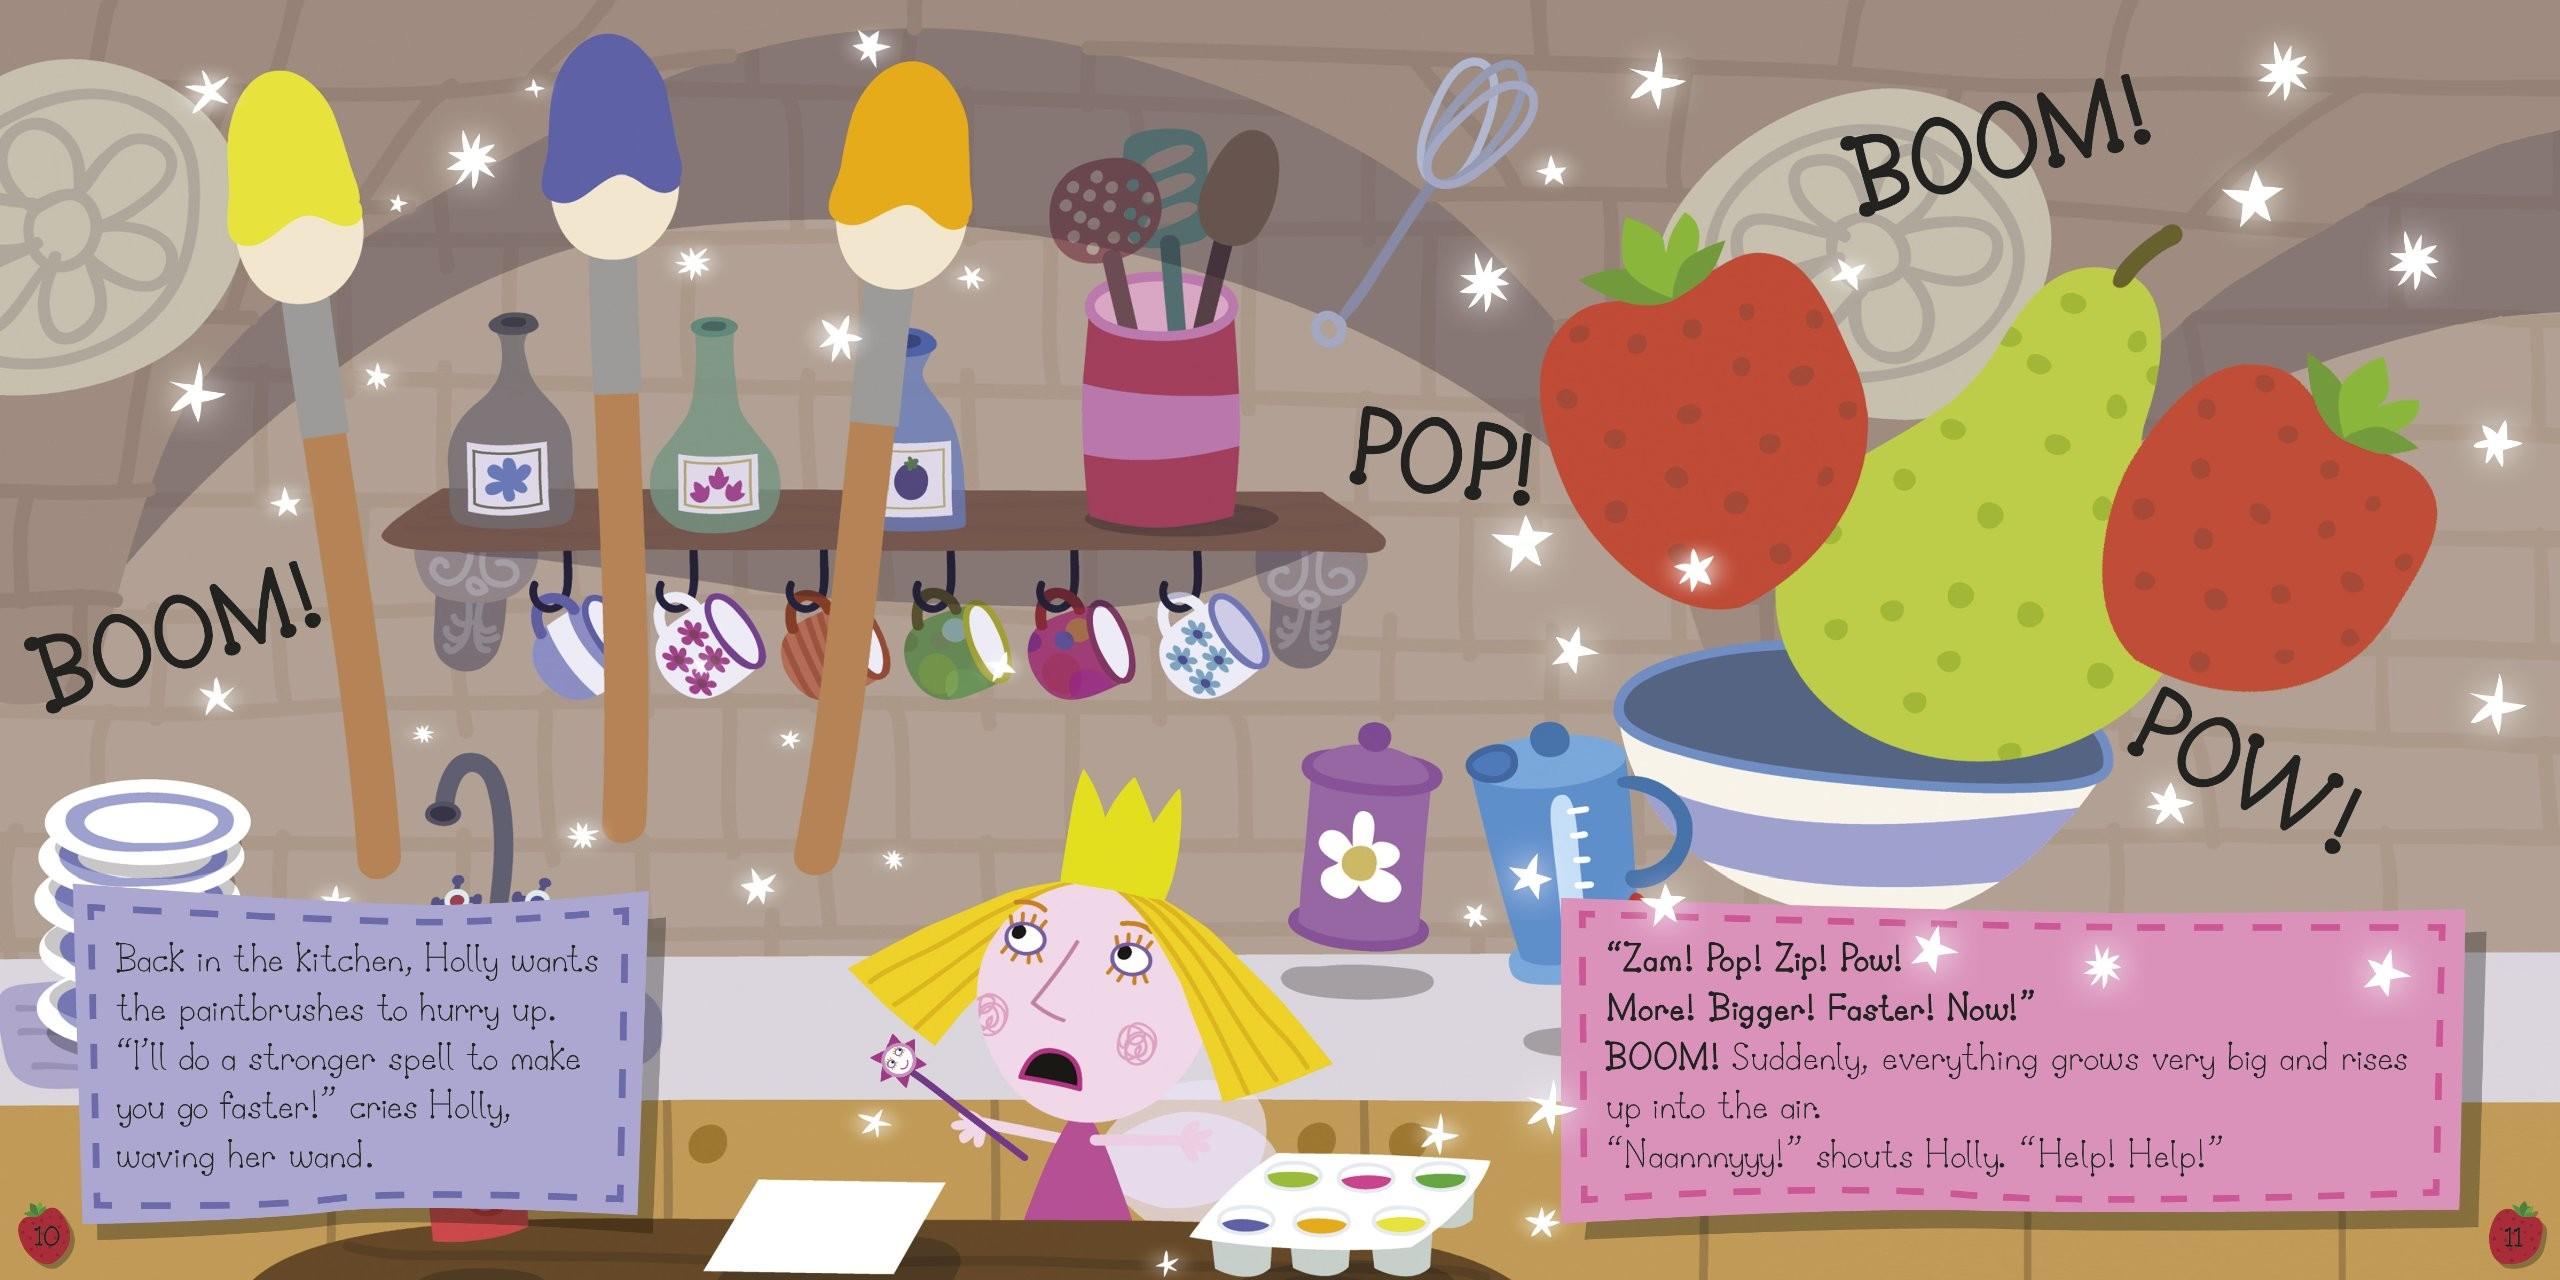 Ben and Holly's Little Kingdom: Ben Elf's Birthday Storybook (Ben & Holly's  Little Kingdom): Amazon.co.uk: Ladybird: 9781409308881: Books